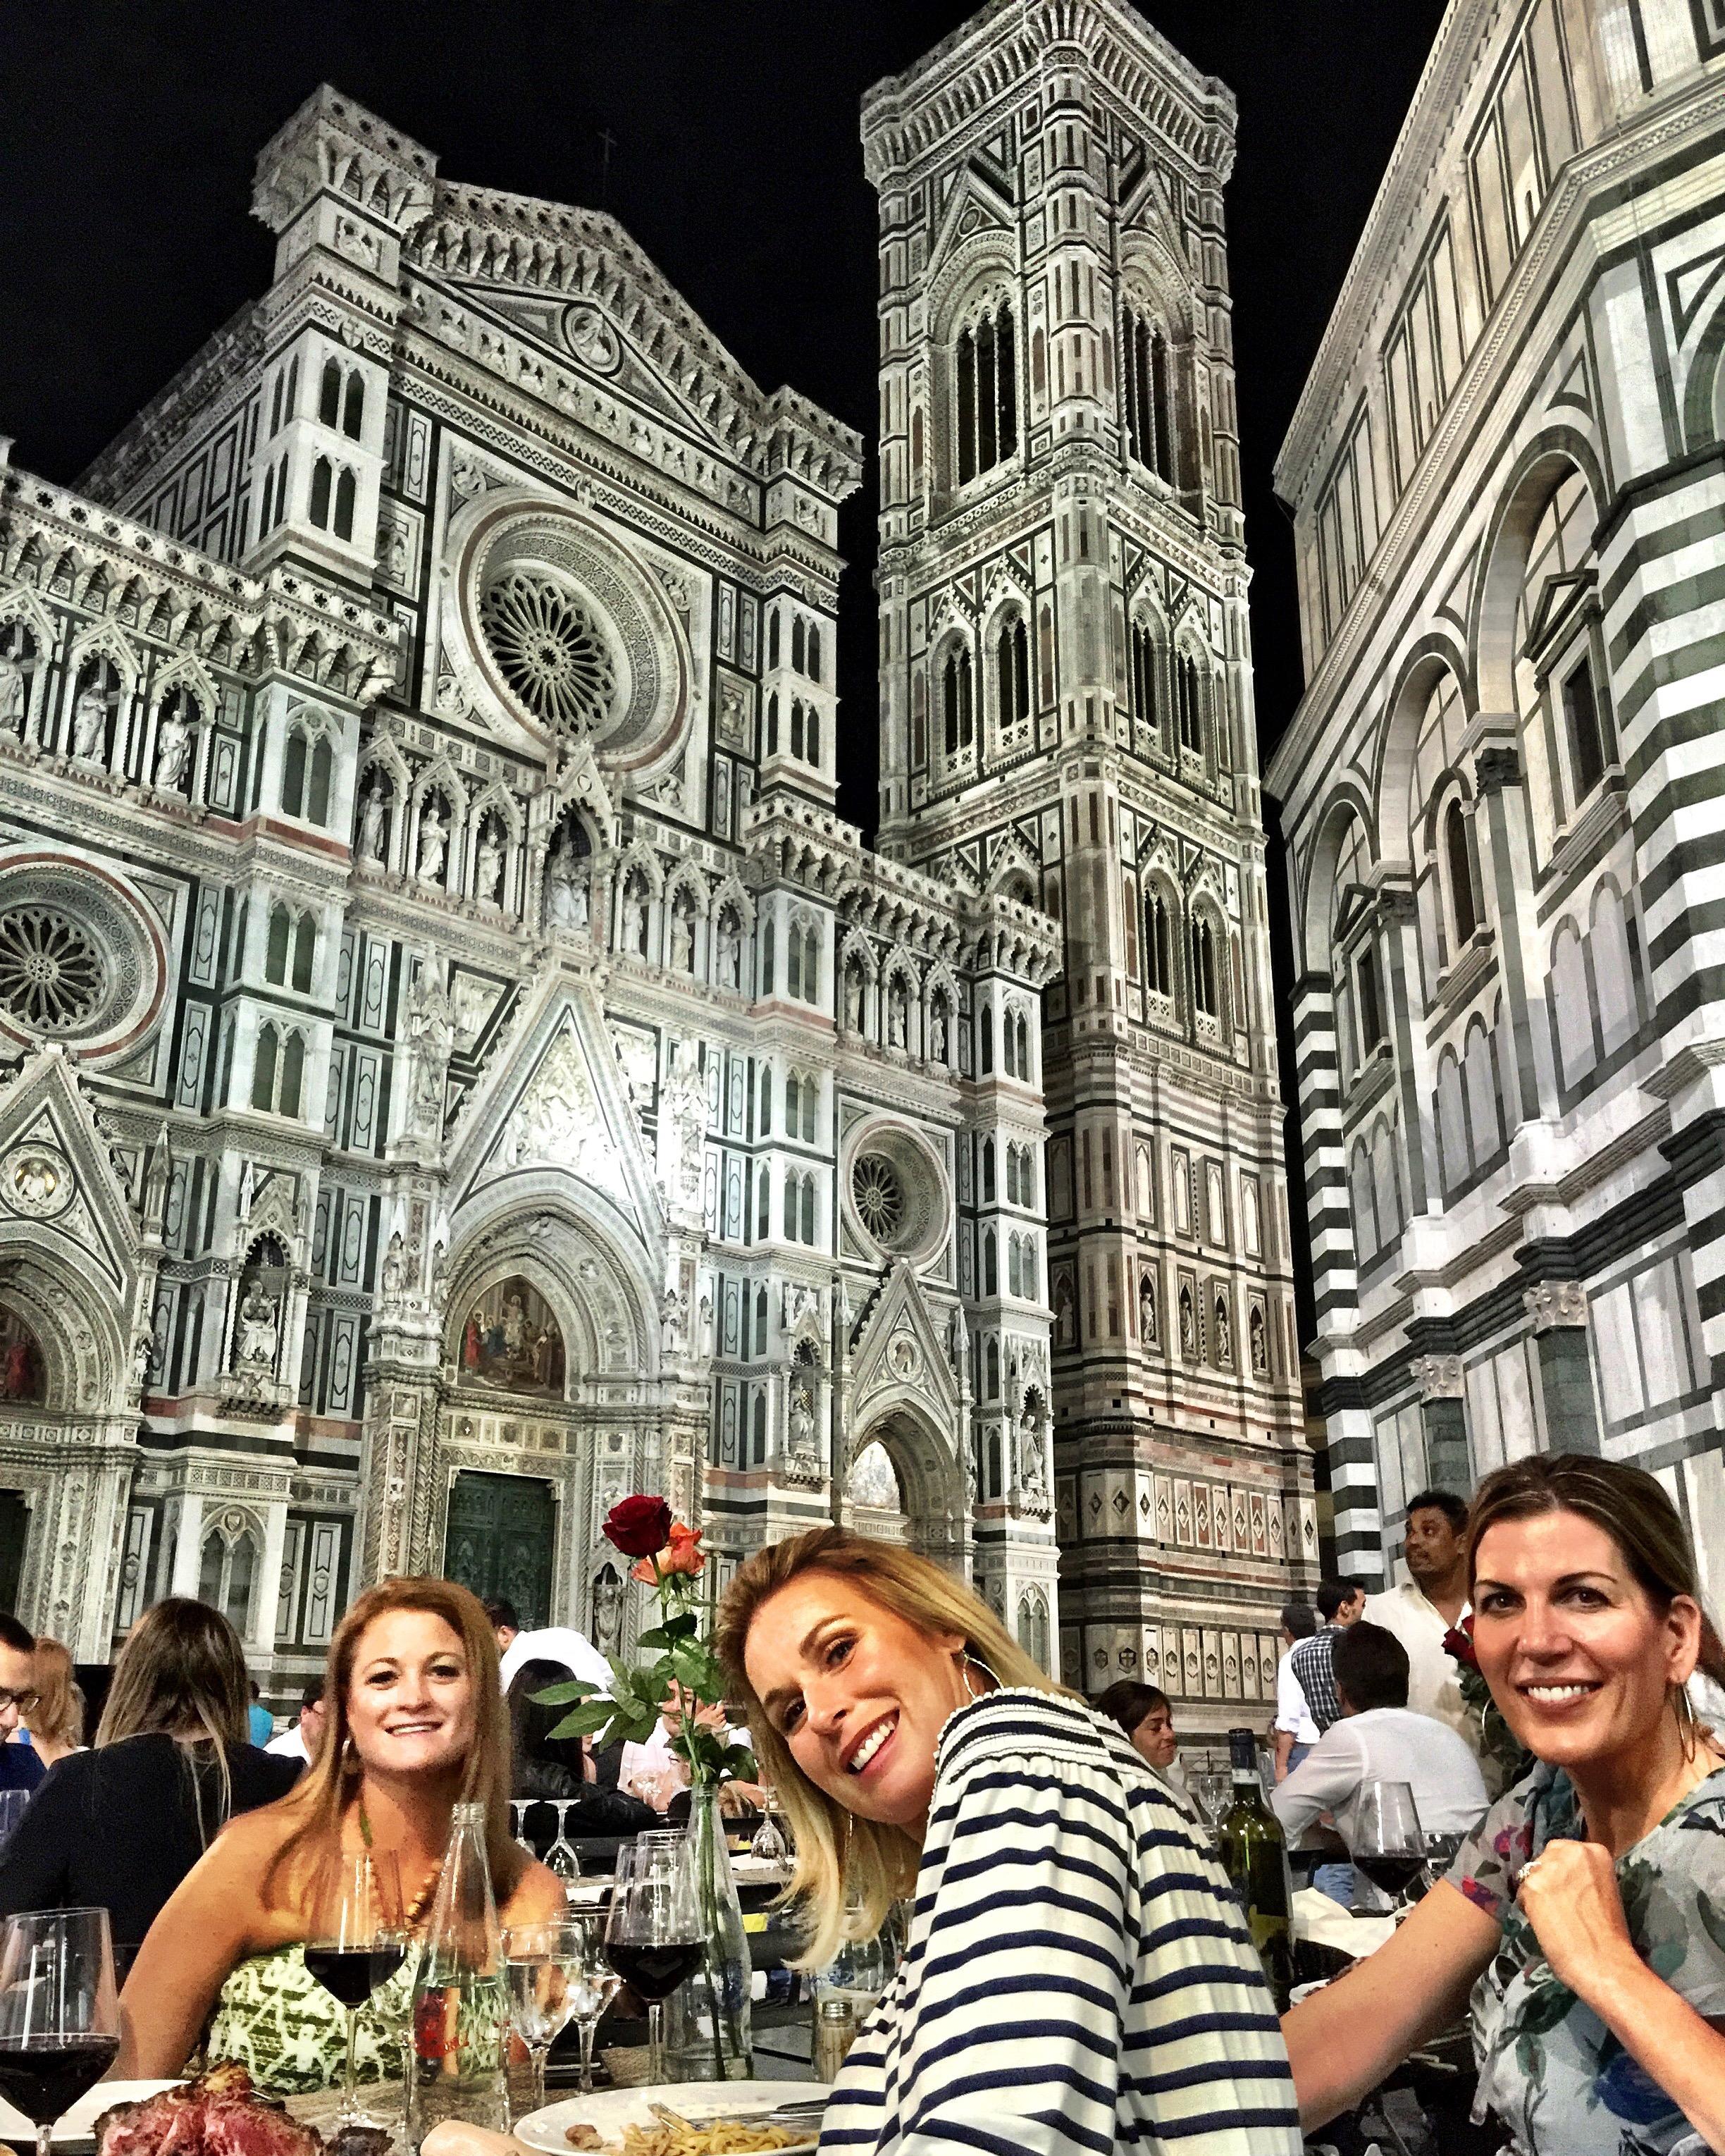 Kimberly Banach, Theresa Steg and Isabel in Firenze